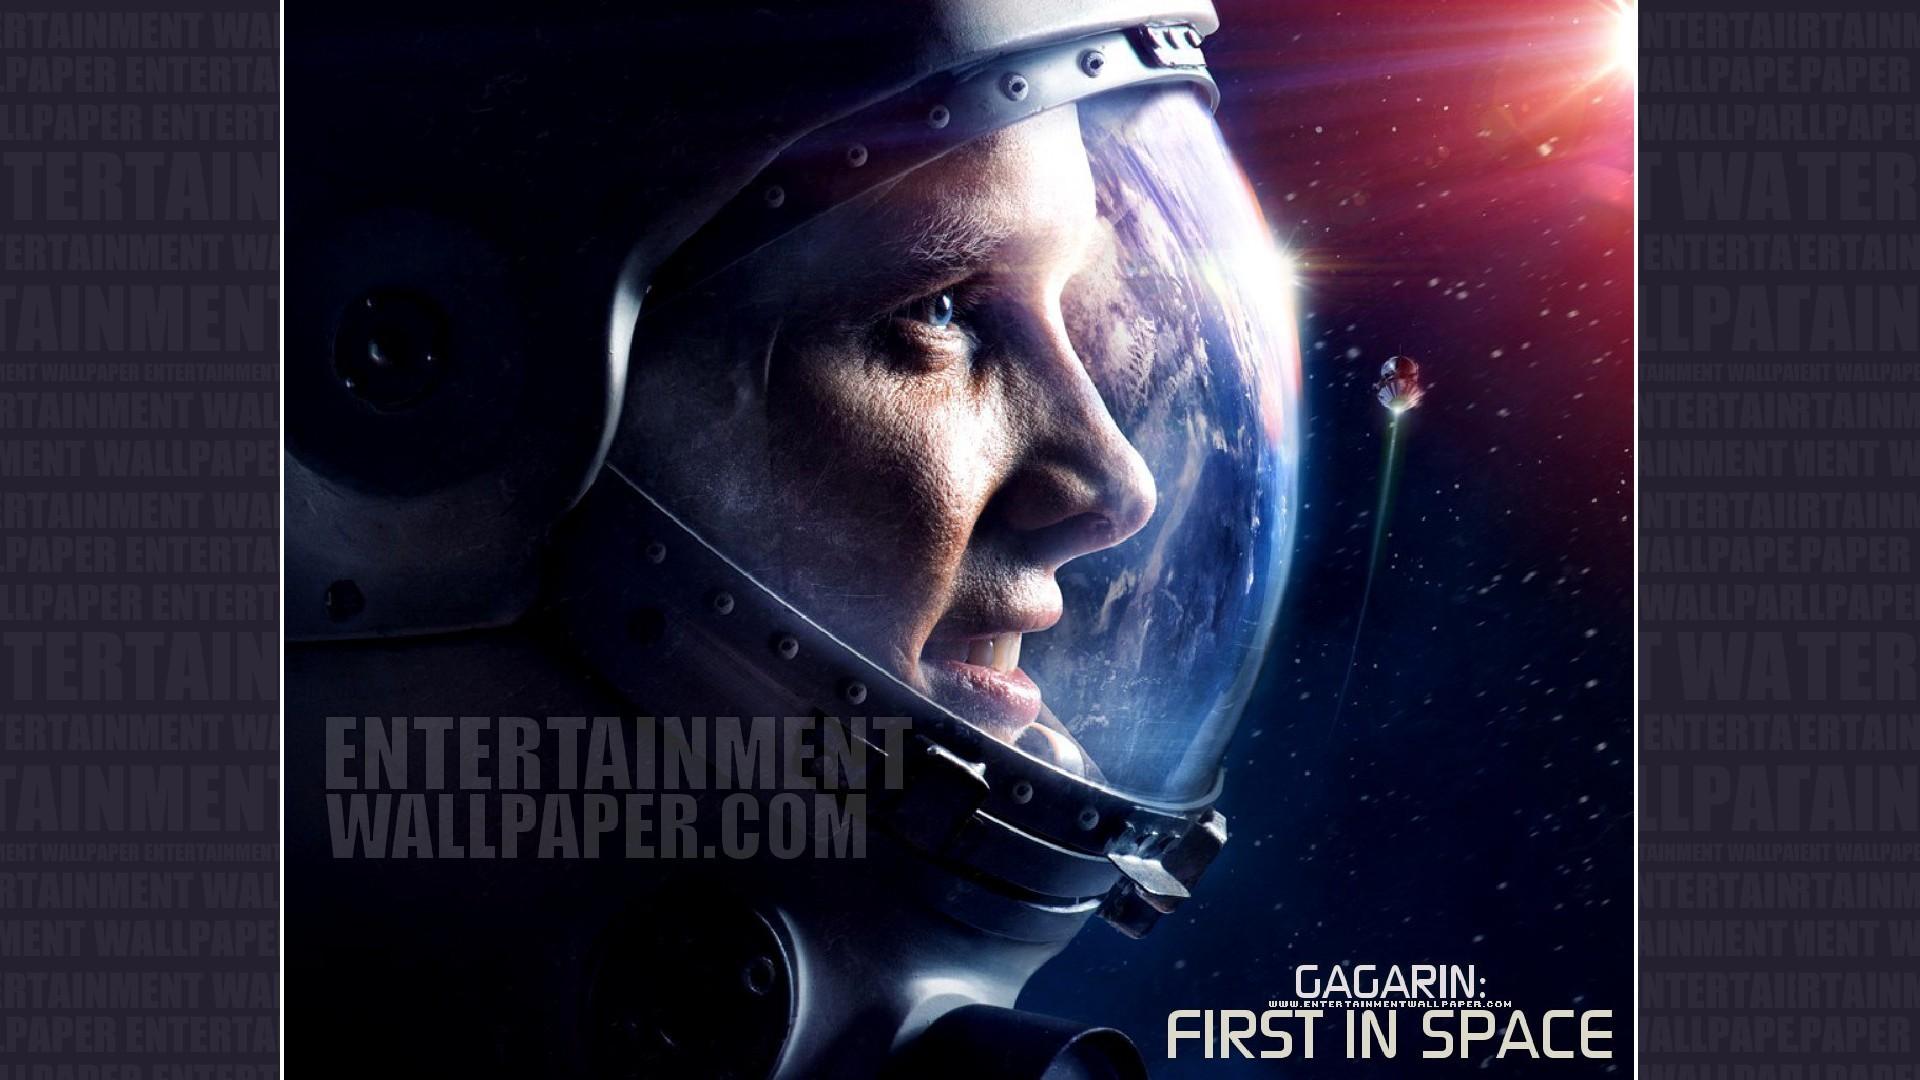 Gagarin: First in Space Wa.